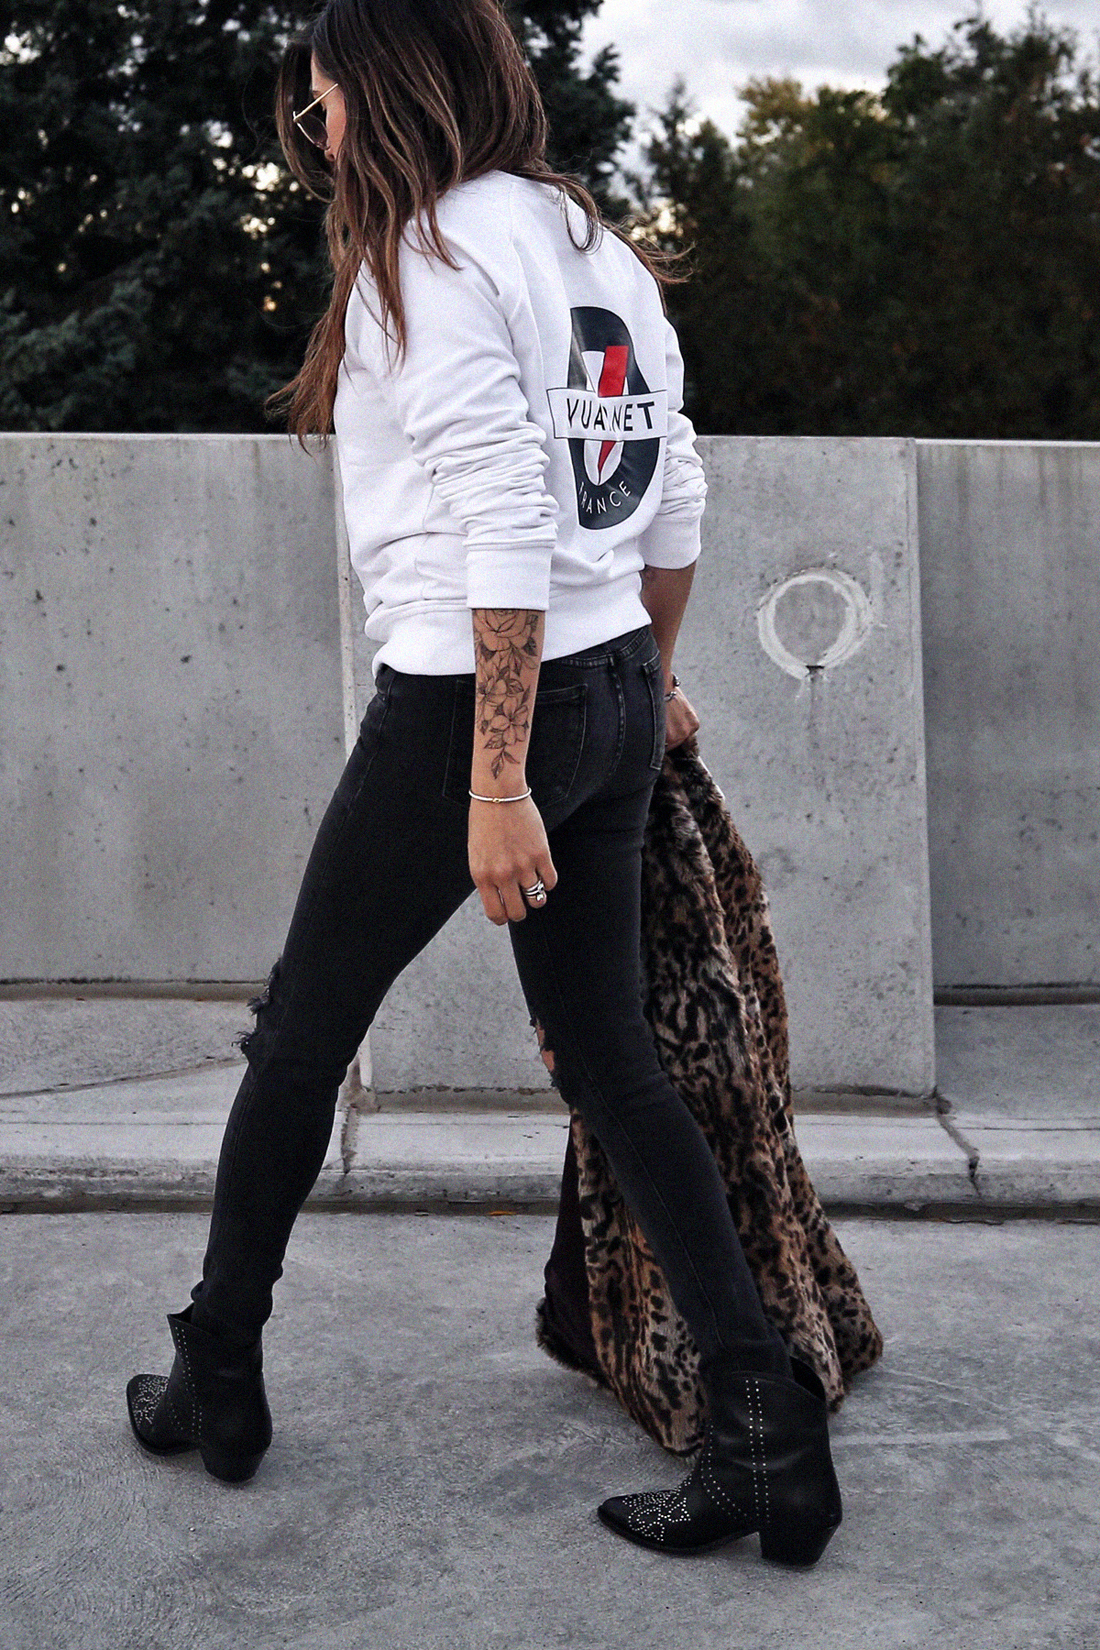 leopard print coat, rag & bone distressed jeans, isabel marant studded dollan cowboy boots, vuarnet shirt - photos by woahstyle.com, nathalie martin, fall 2018 12.jpg